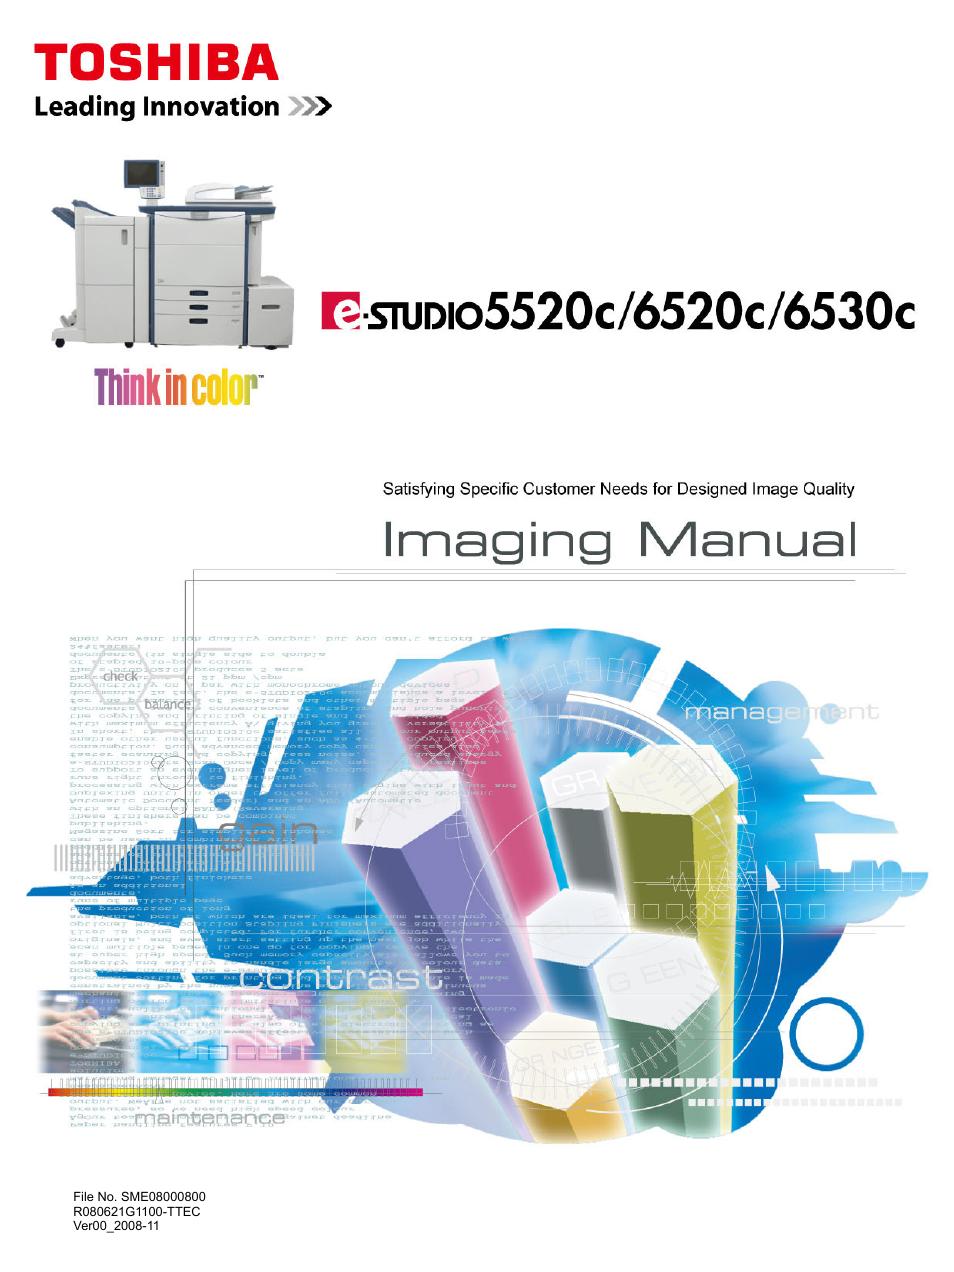 Toshiba e-Studio Imaging 6520c User Manual | 288 pages | Also for: e-Studio  Imaging 6530c, e-Studio Imaging 5520c